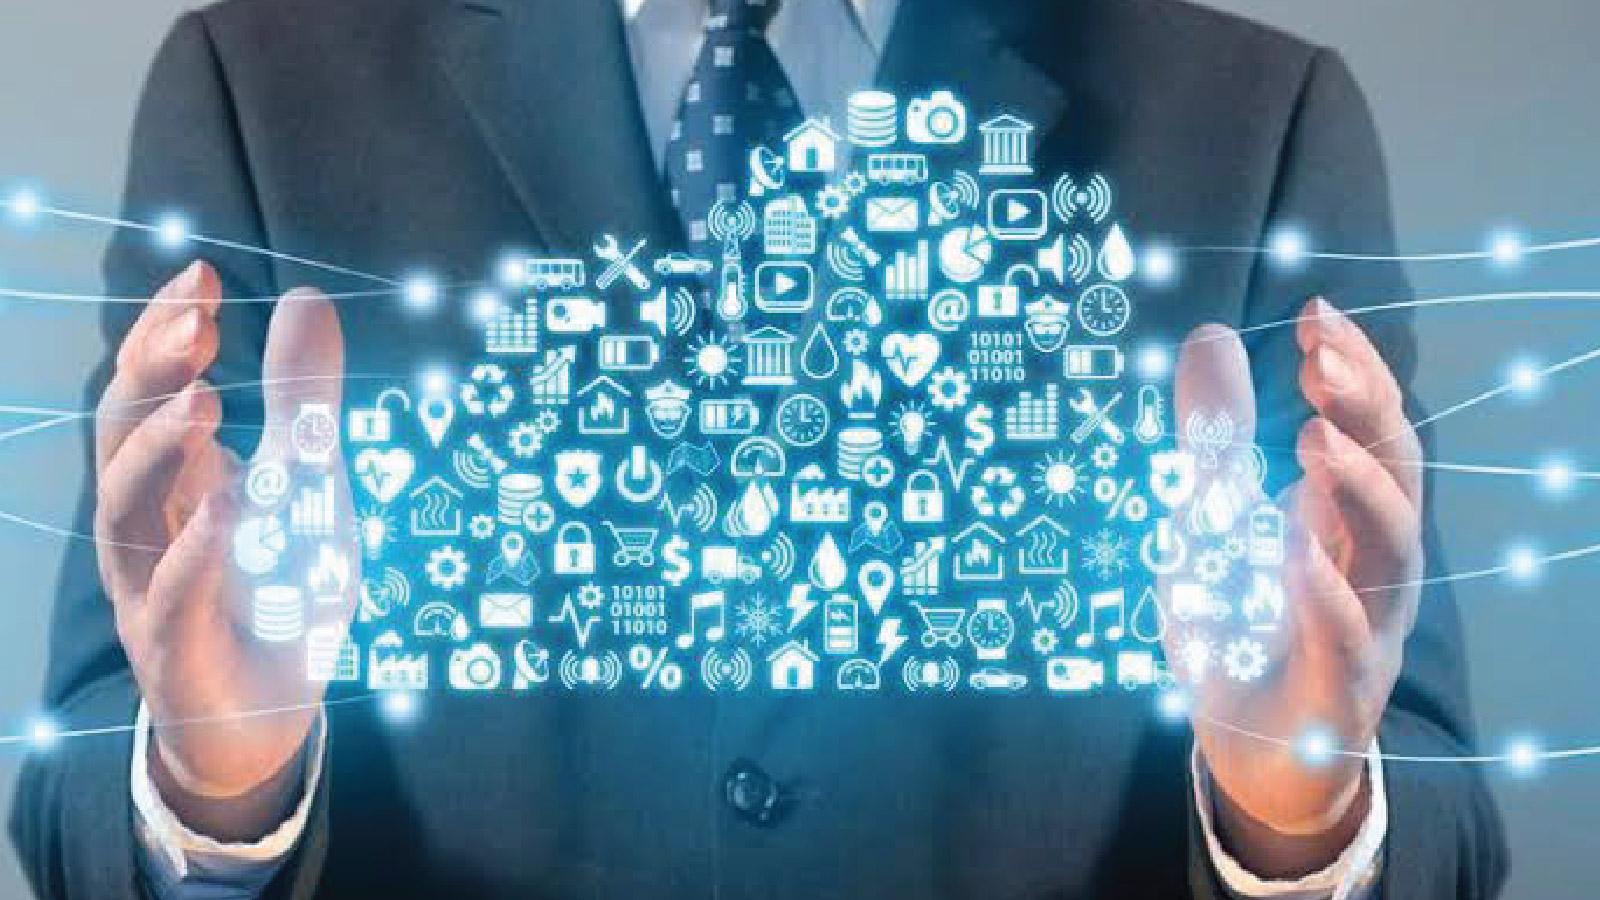 Digitalization Led IT Revolution Transforming the Global Labor Market